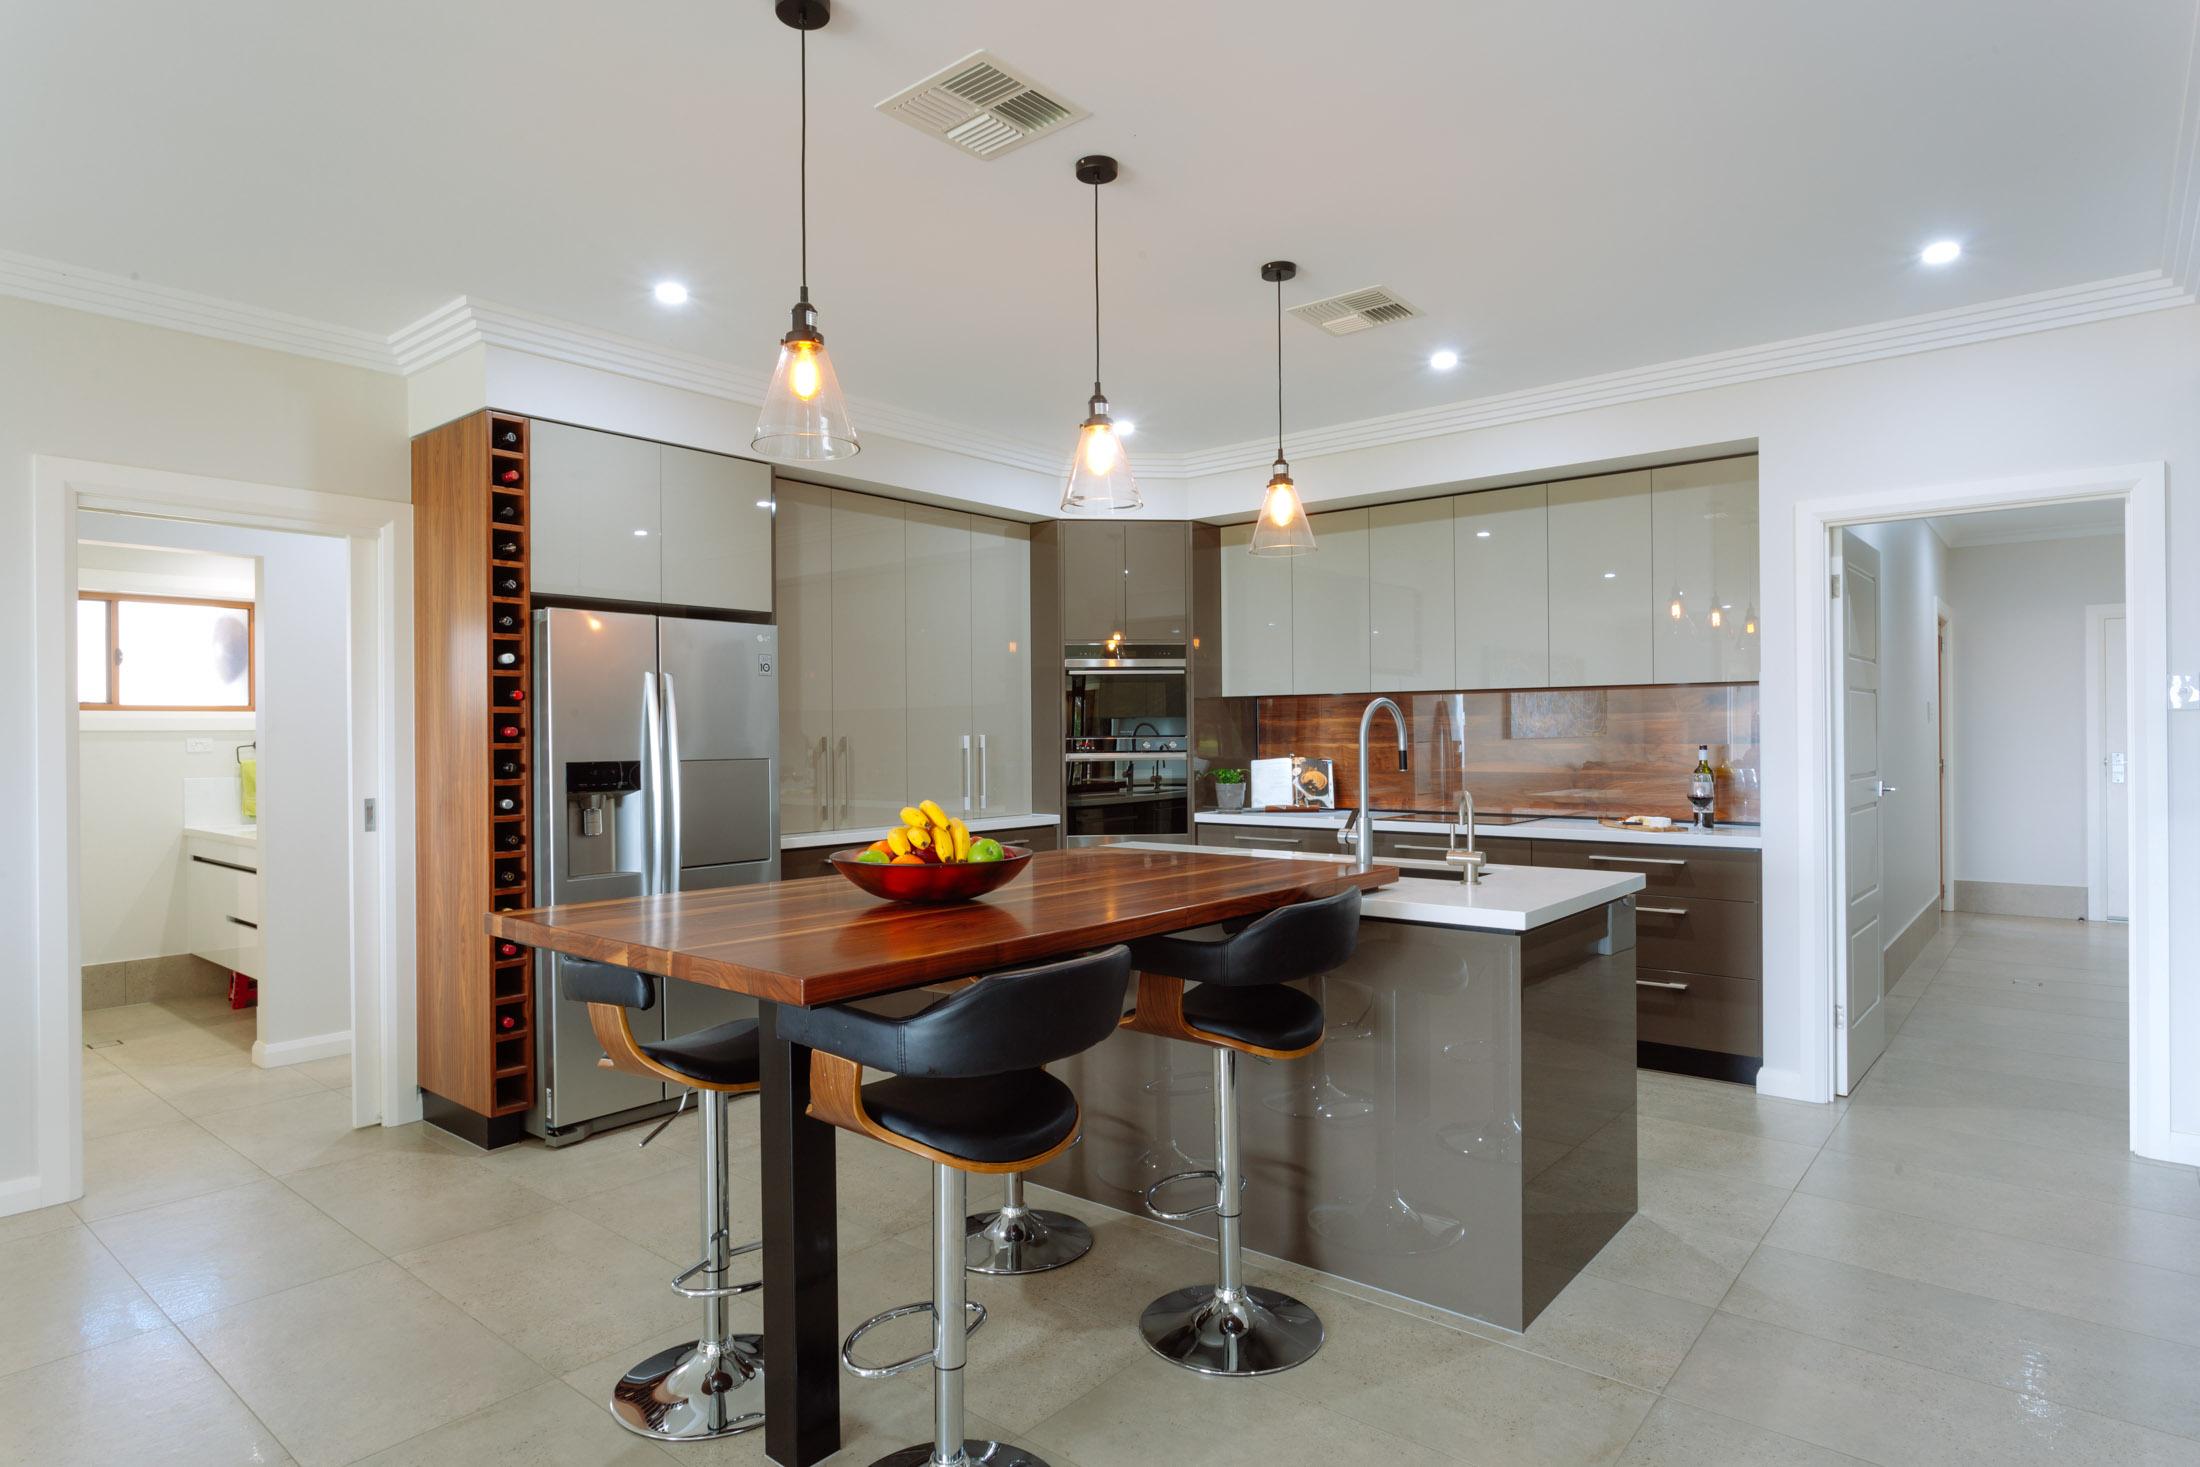 Miller Kitchens -_MG_8650.jpg